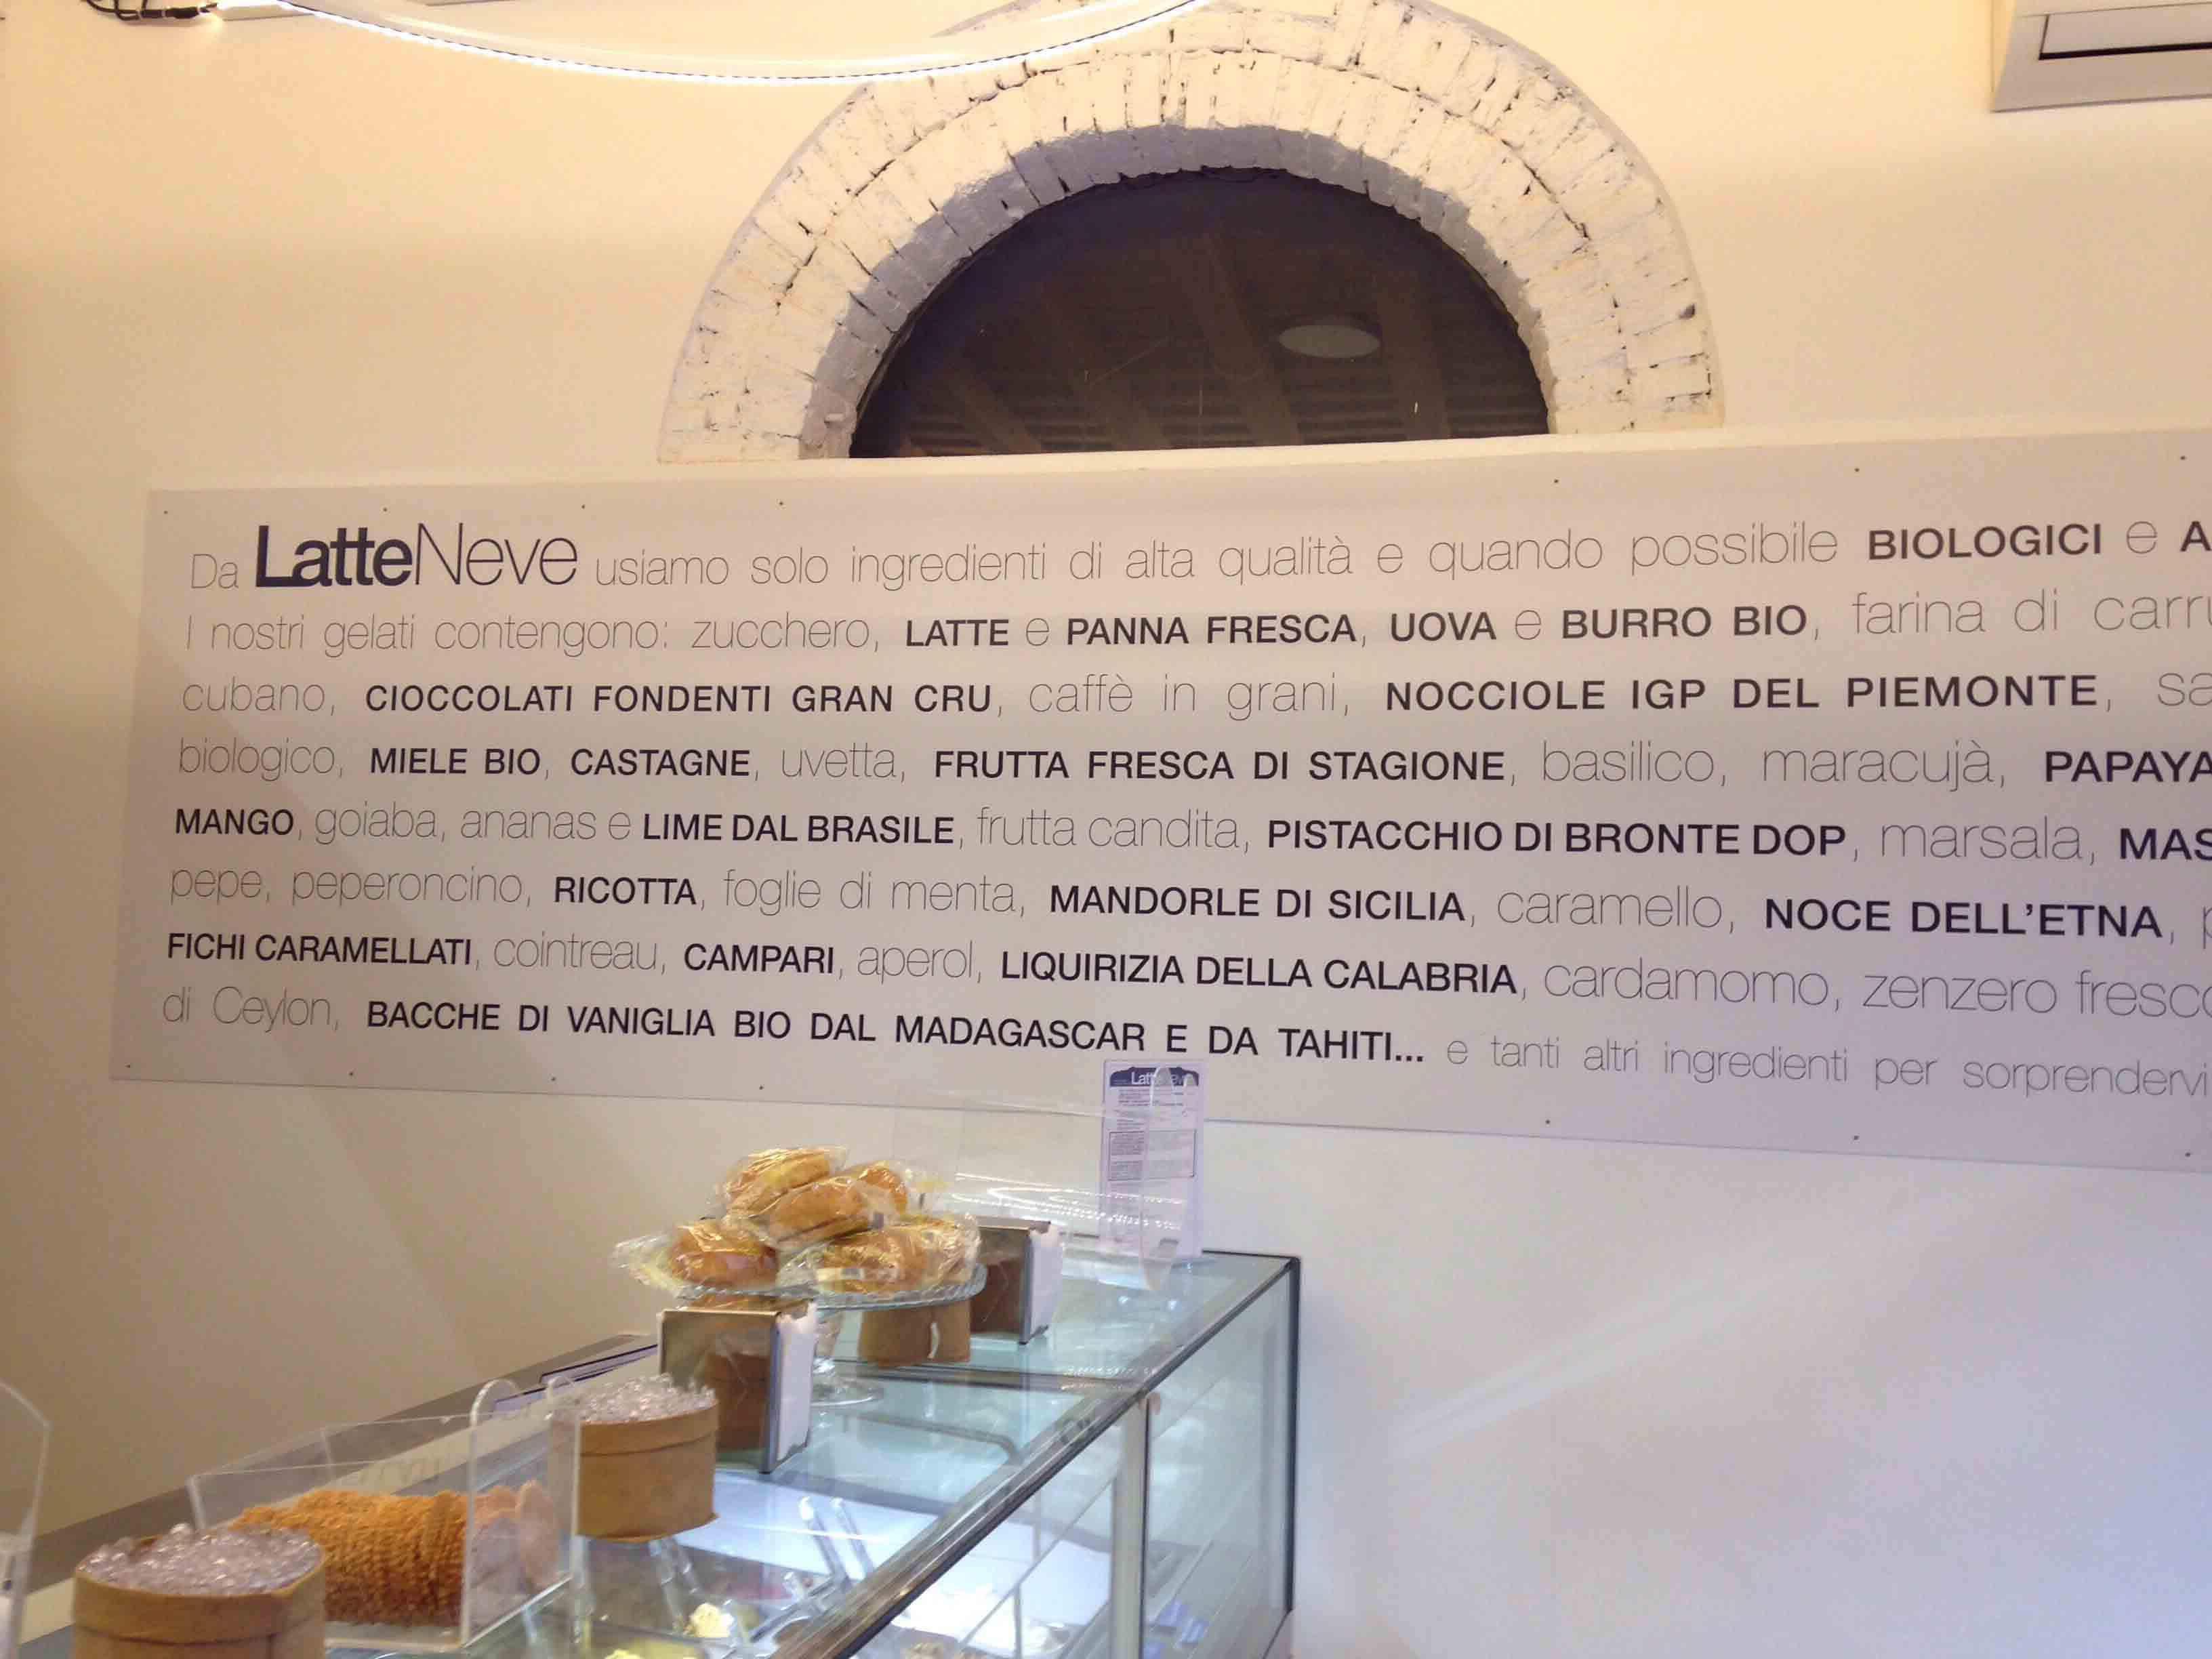 Mille Gusti Nova Milanese Prezzi latteneve menu, menu for latteneve, navigli, milano